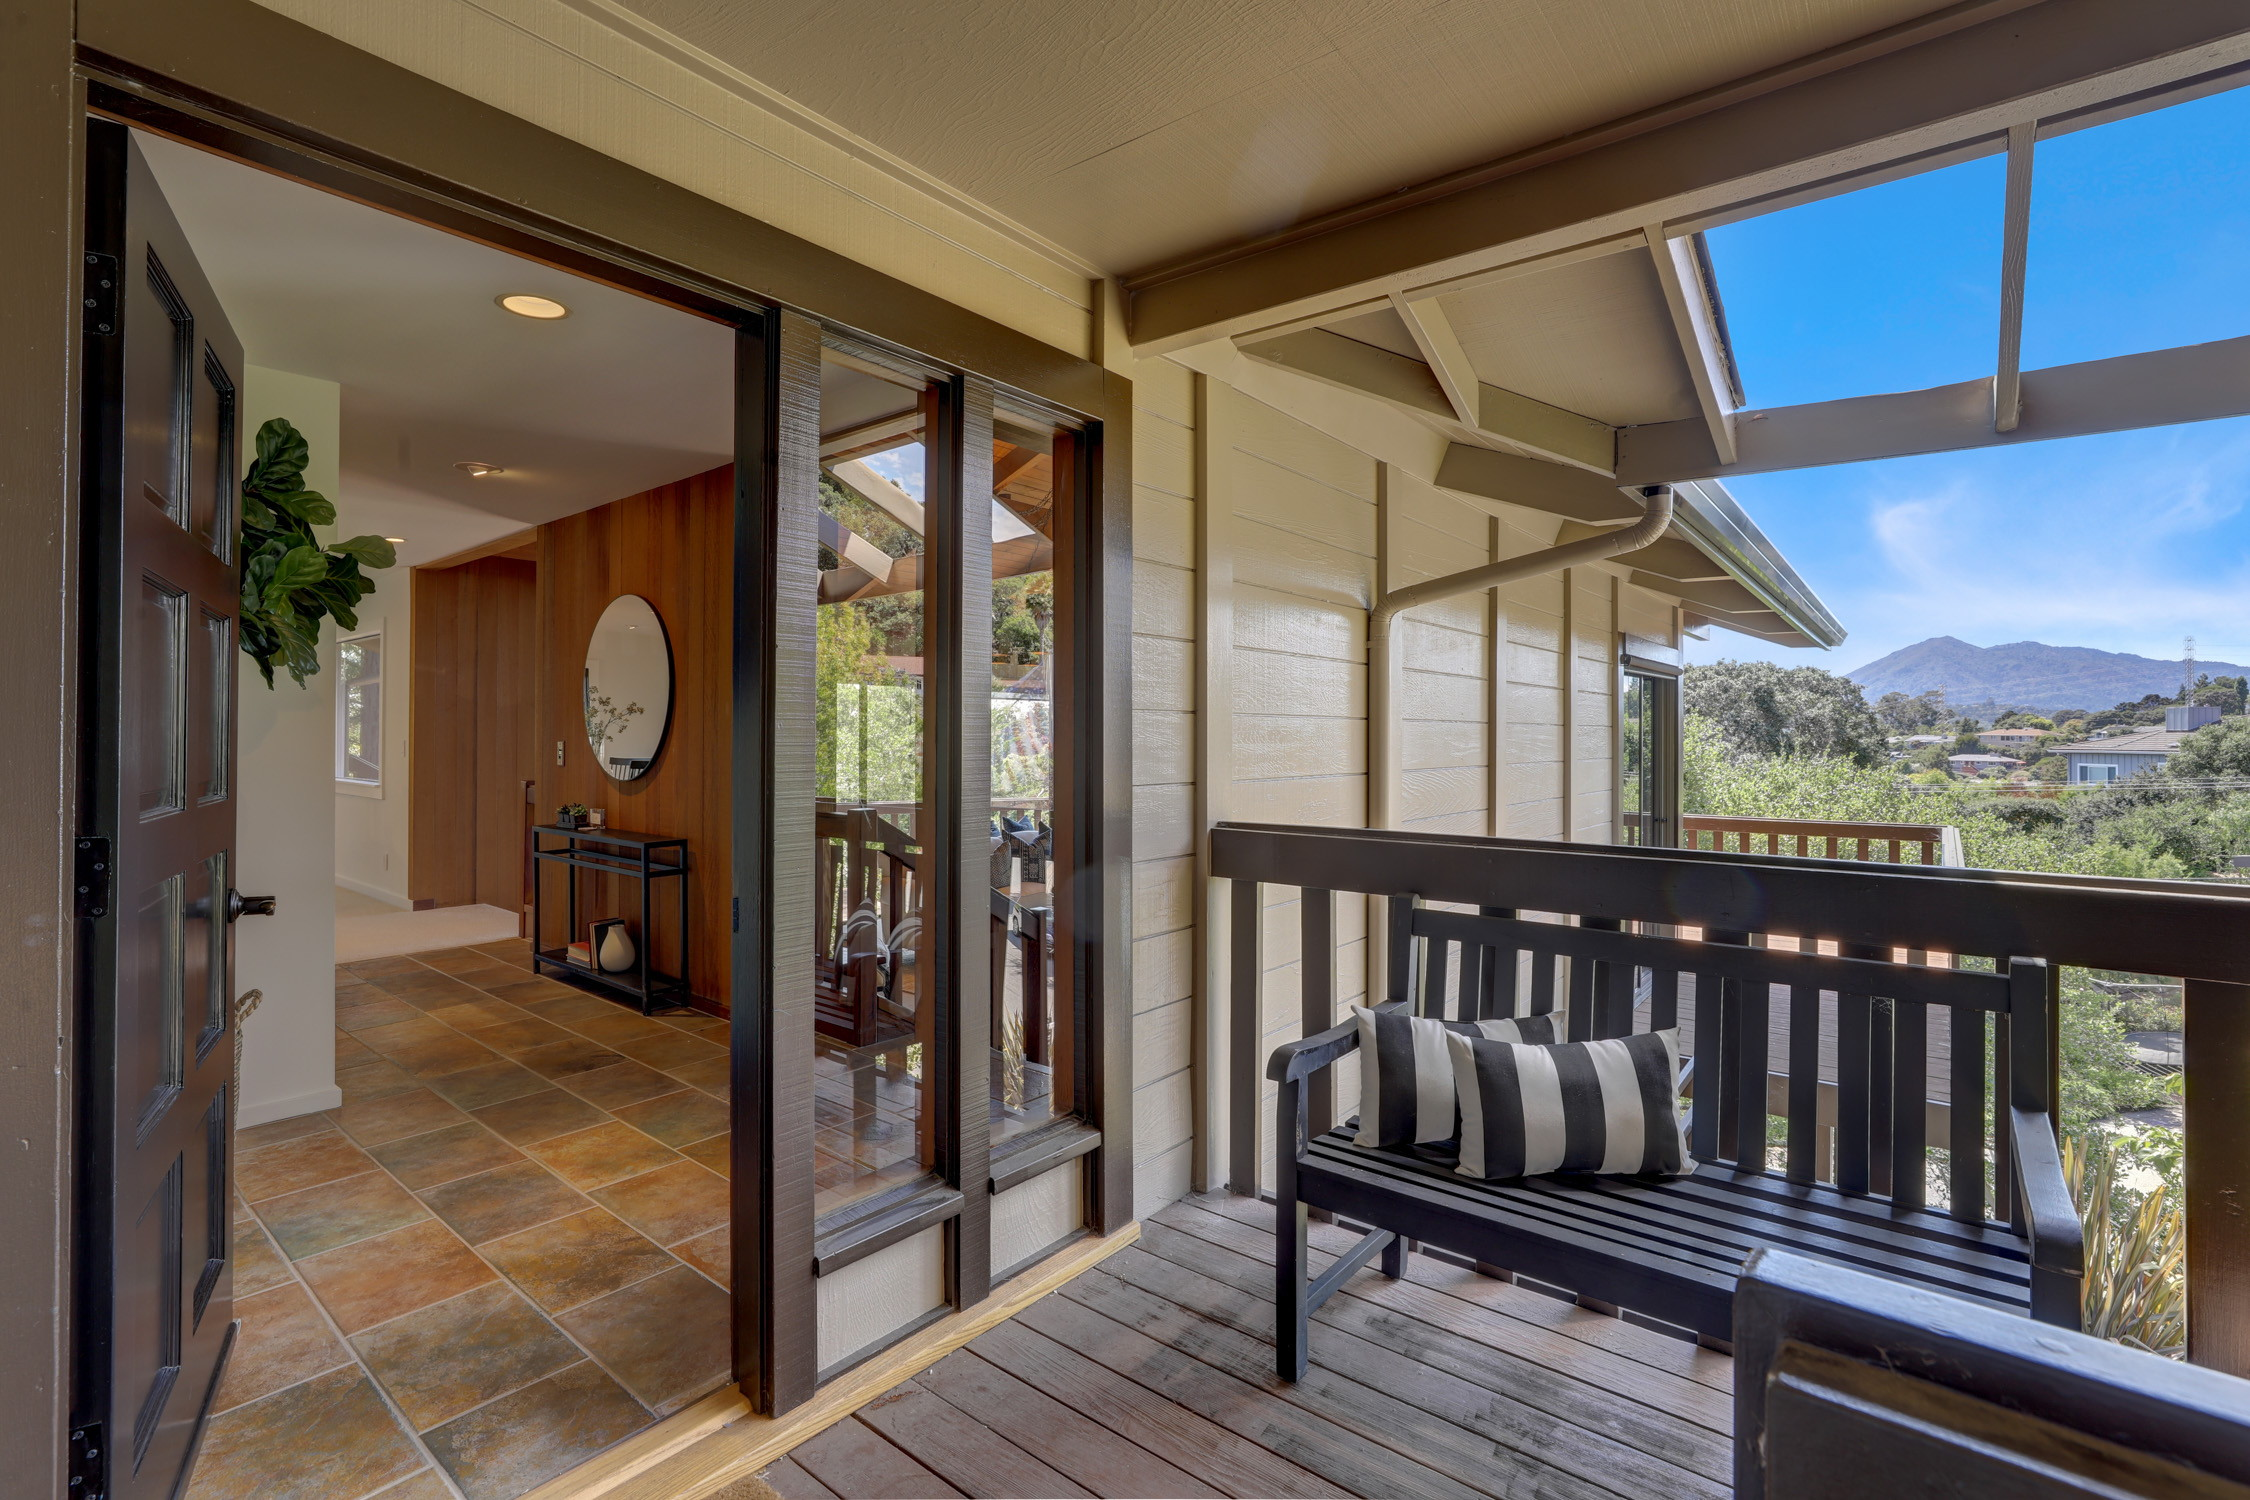 16Dorian 06 MLSSan Rafael Real Estate - Listed by Julia Fitzpatrick + Allie Fornesi Team Own Marin County .jpg